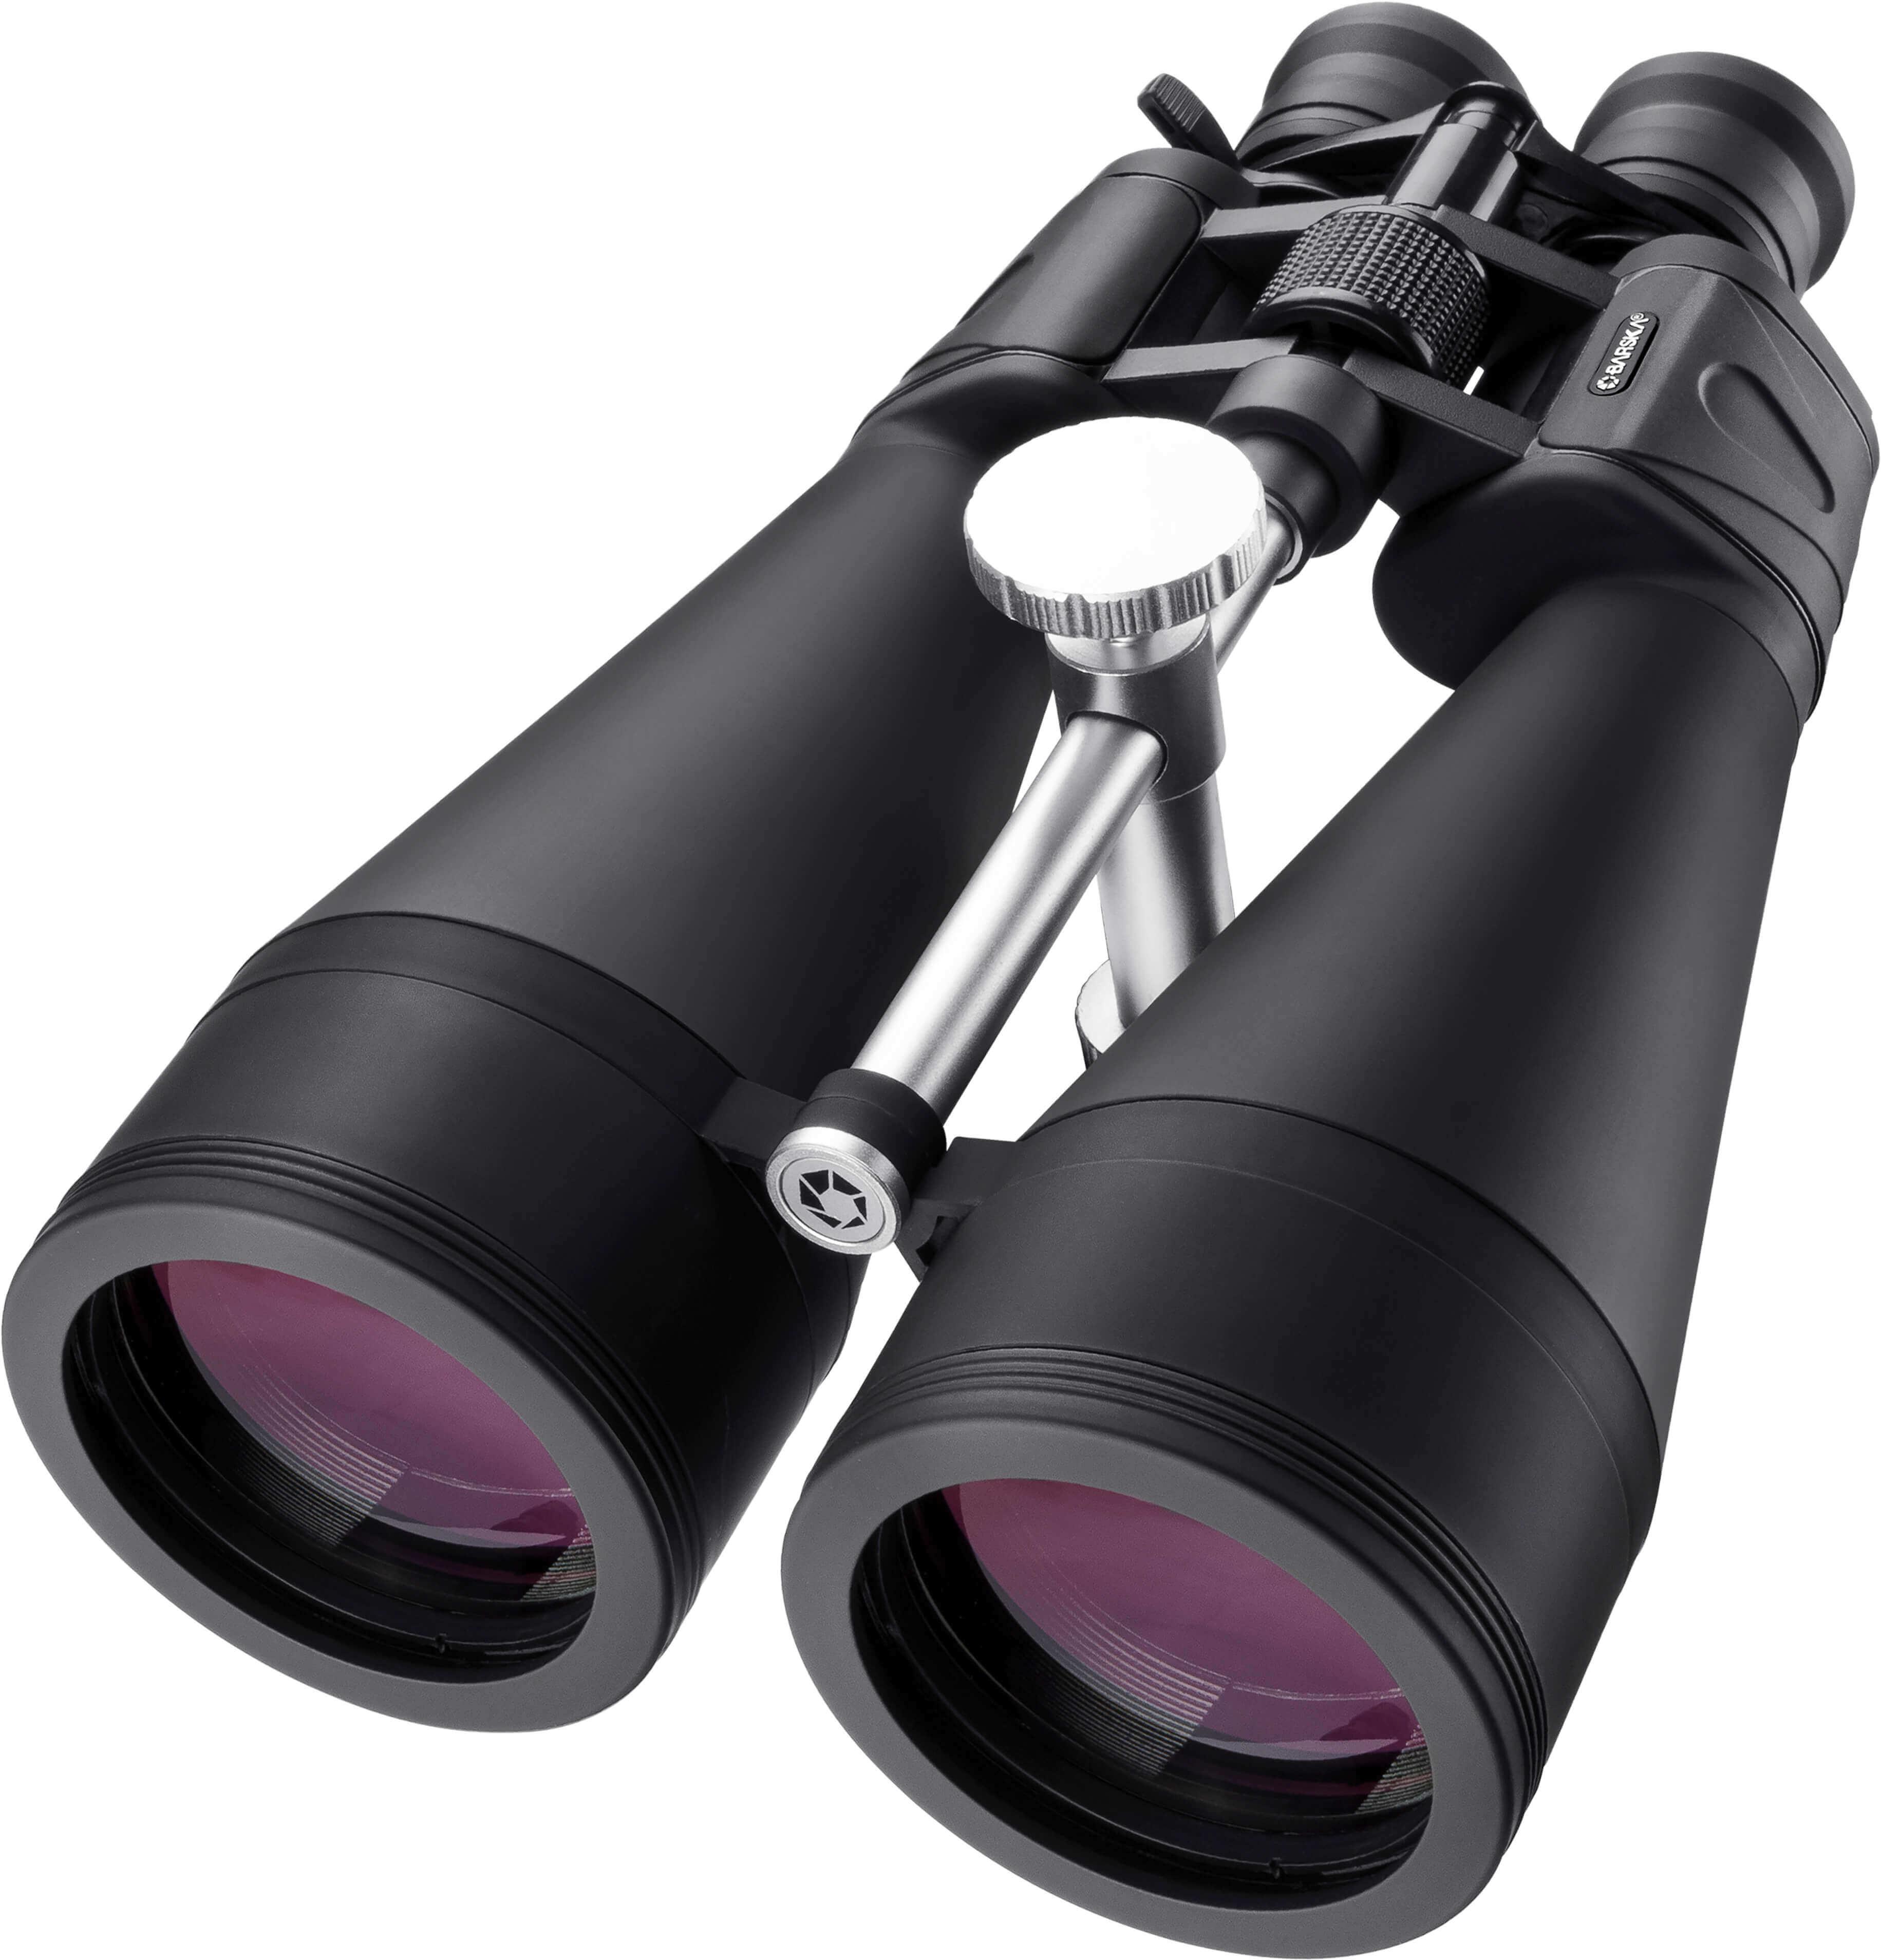 20-140x80 Gladiator Zoom Binoculars